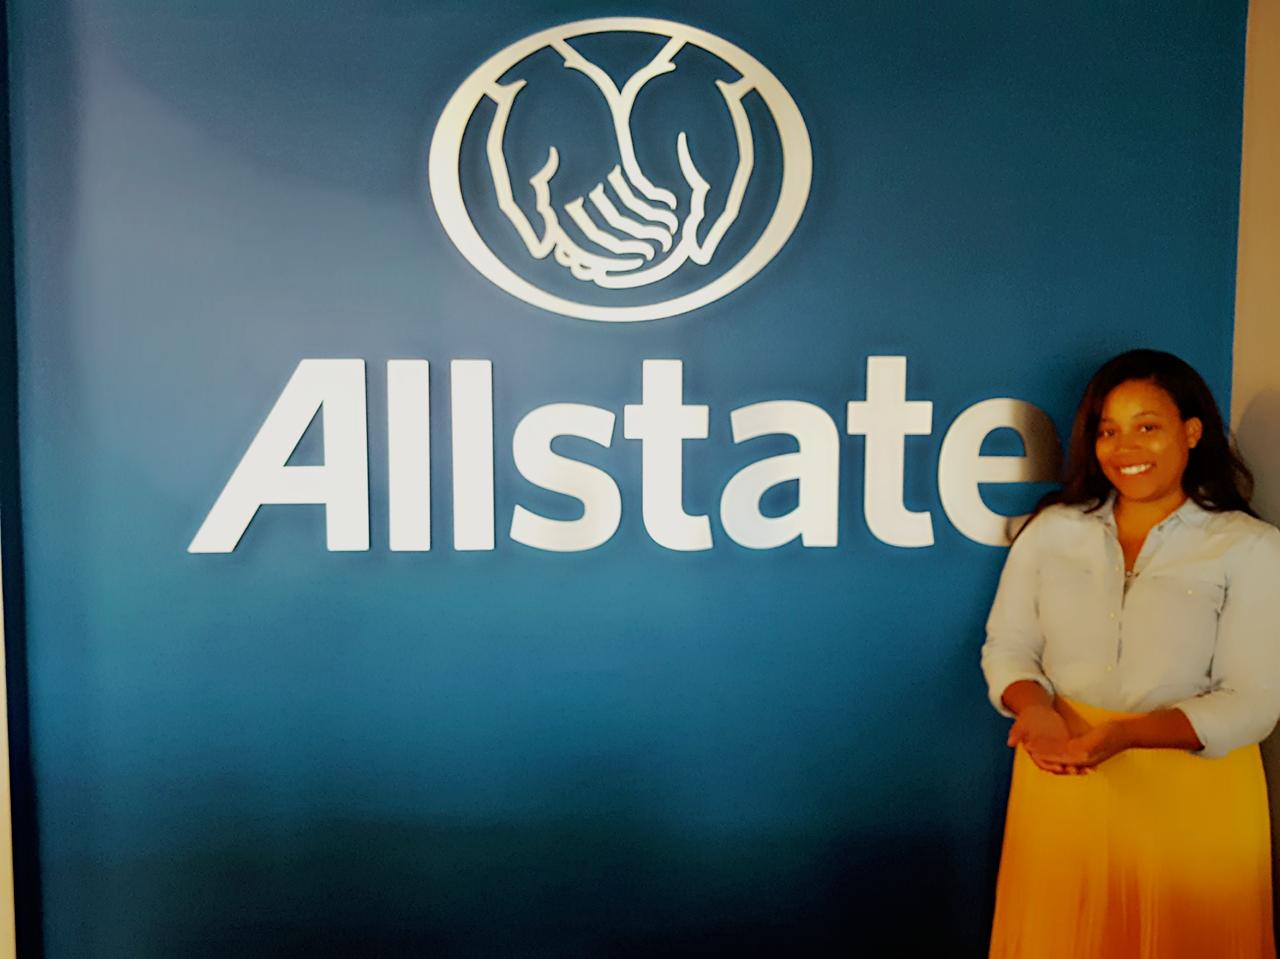 Kenya Buchanan: Allstate Insurance image 1